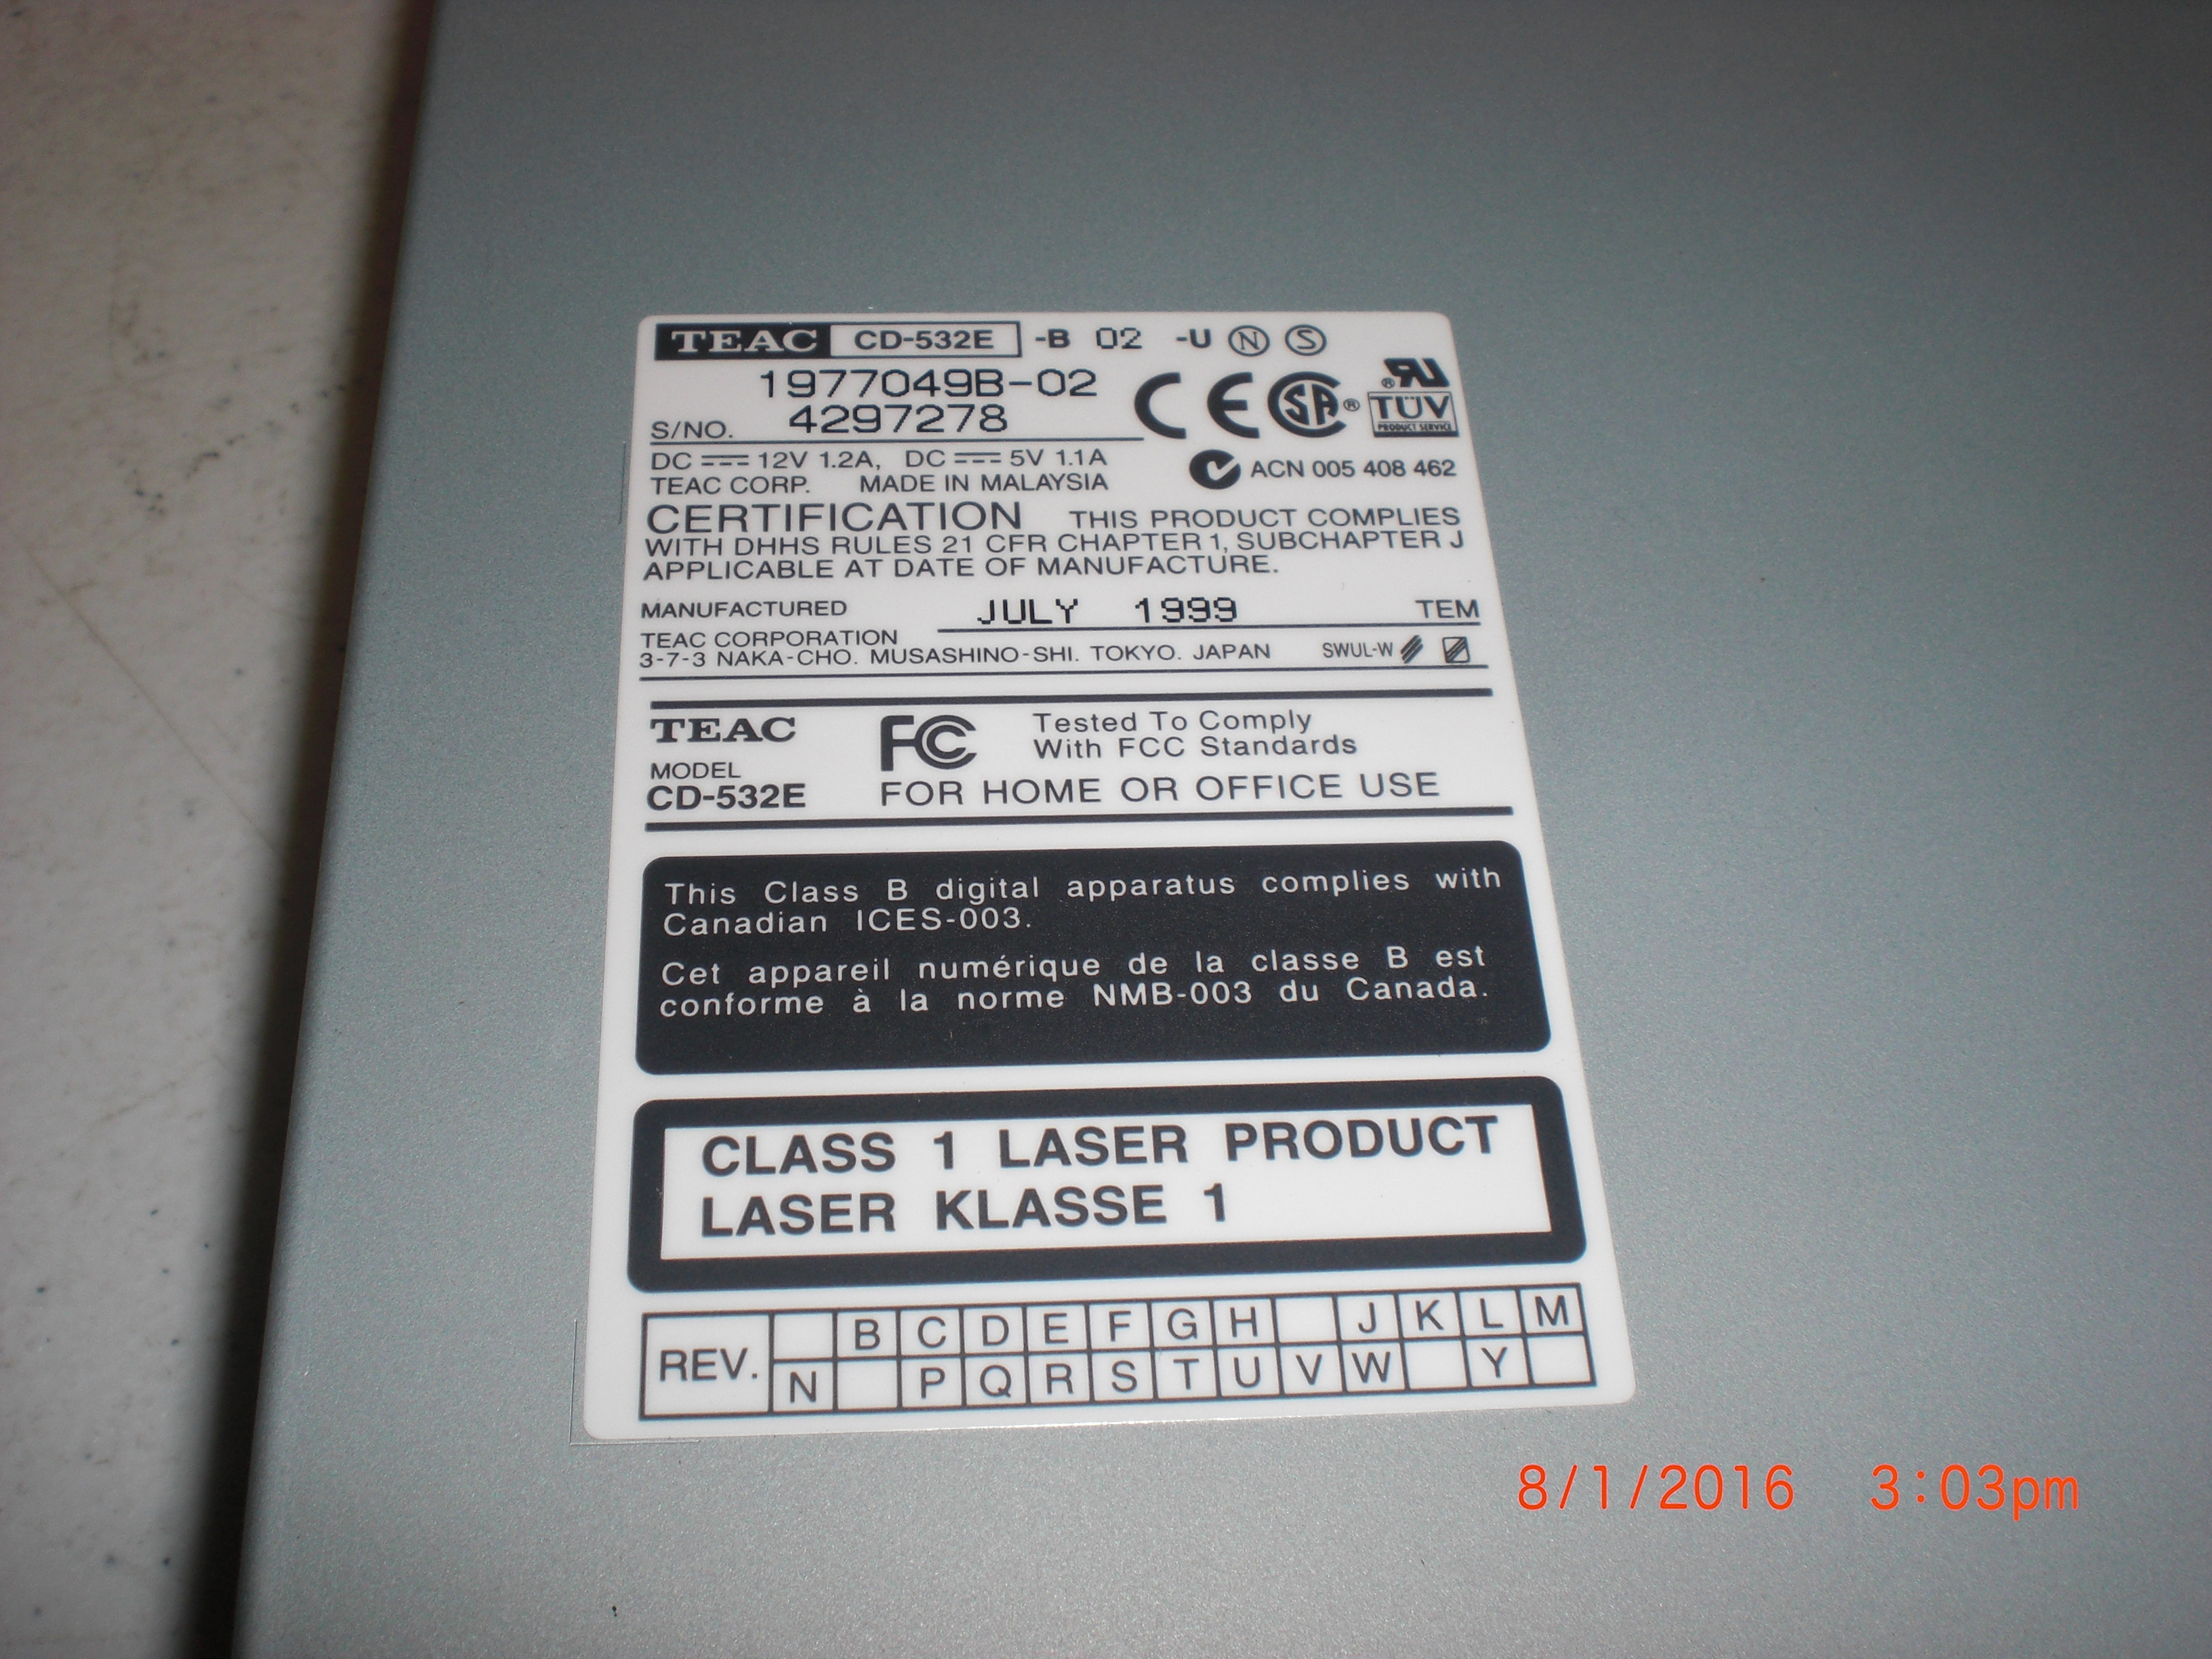 Computer Accessory TEAC CD-532E-B IDE CD-ROM Drive